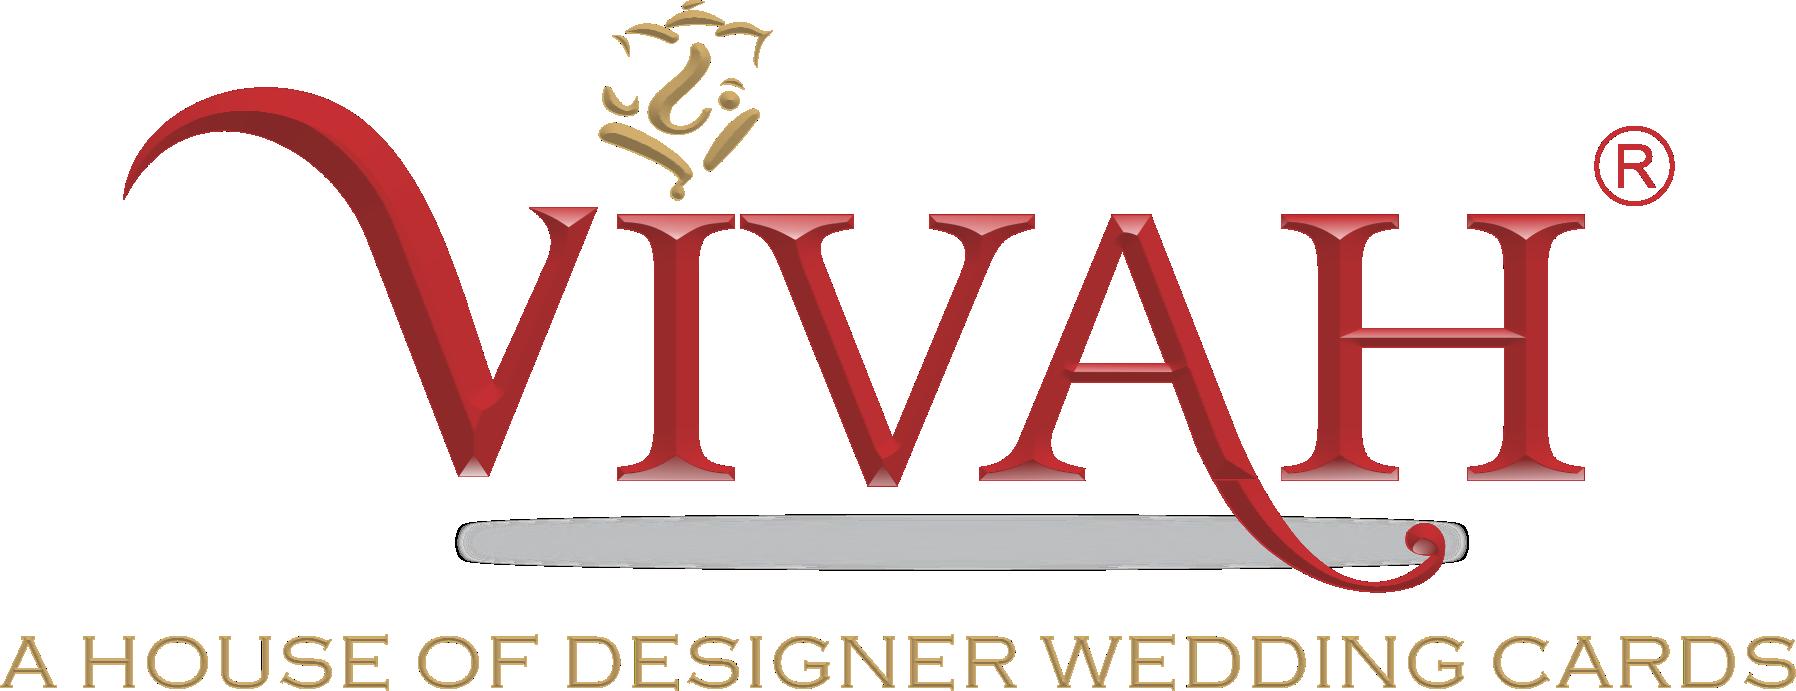 Vivah Cards Vivah Cards - Vivah PNG